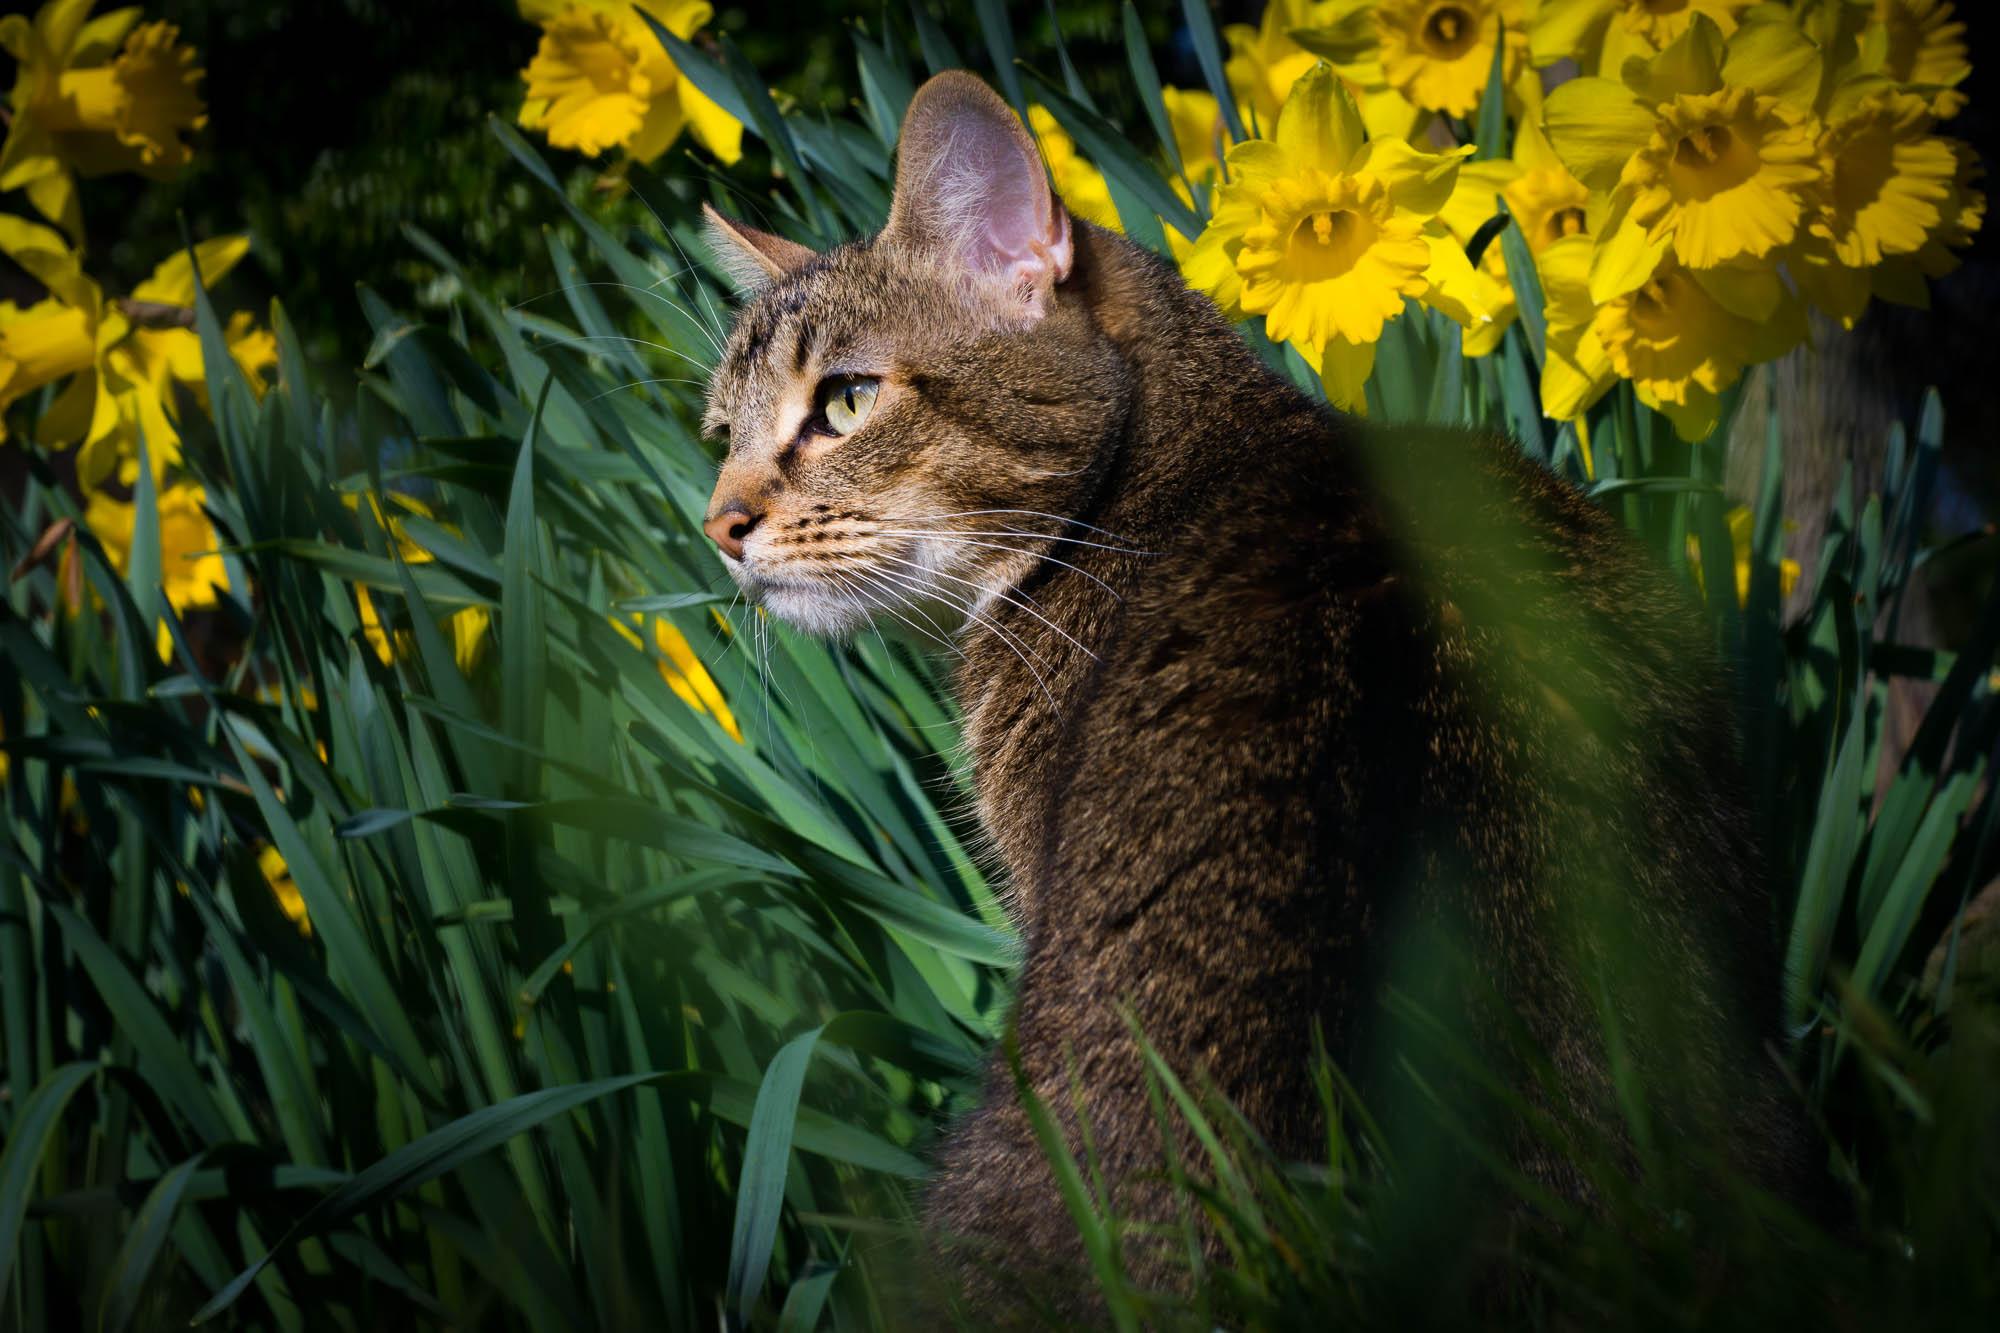 Timotea&yellowflowers